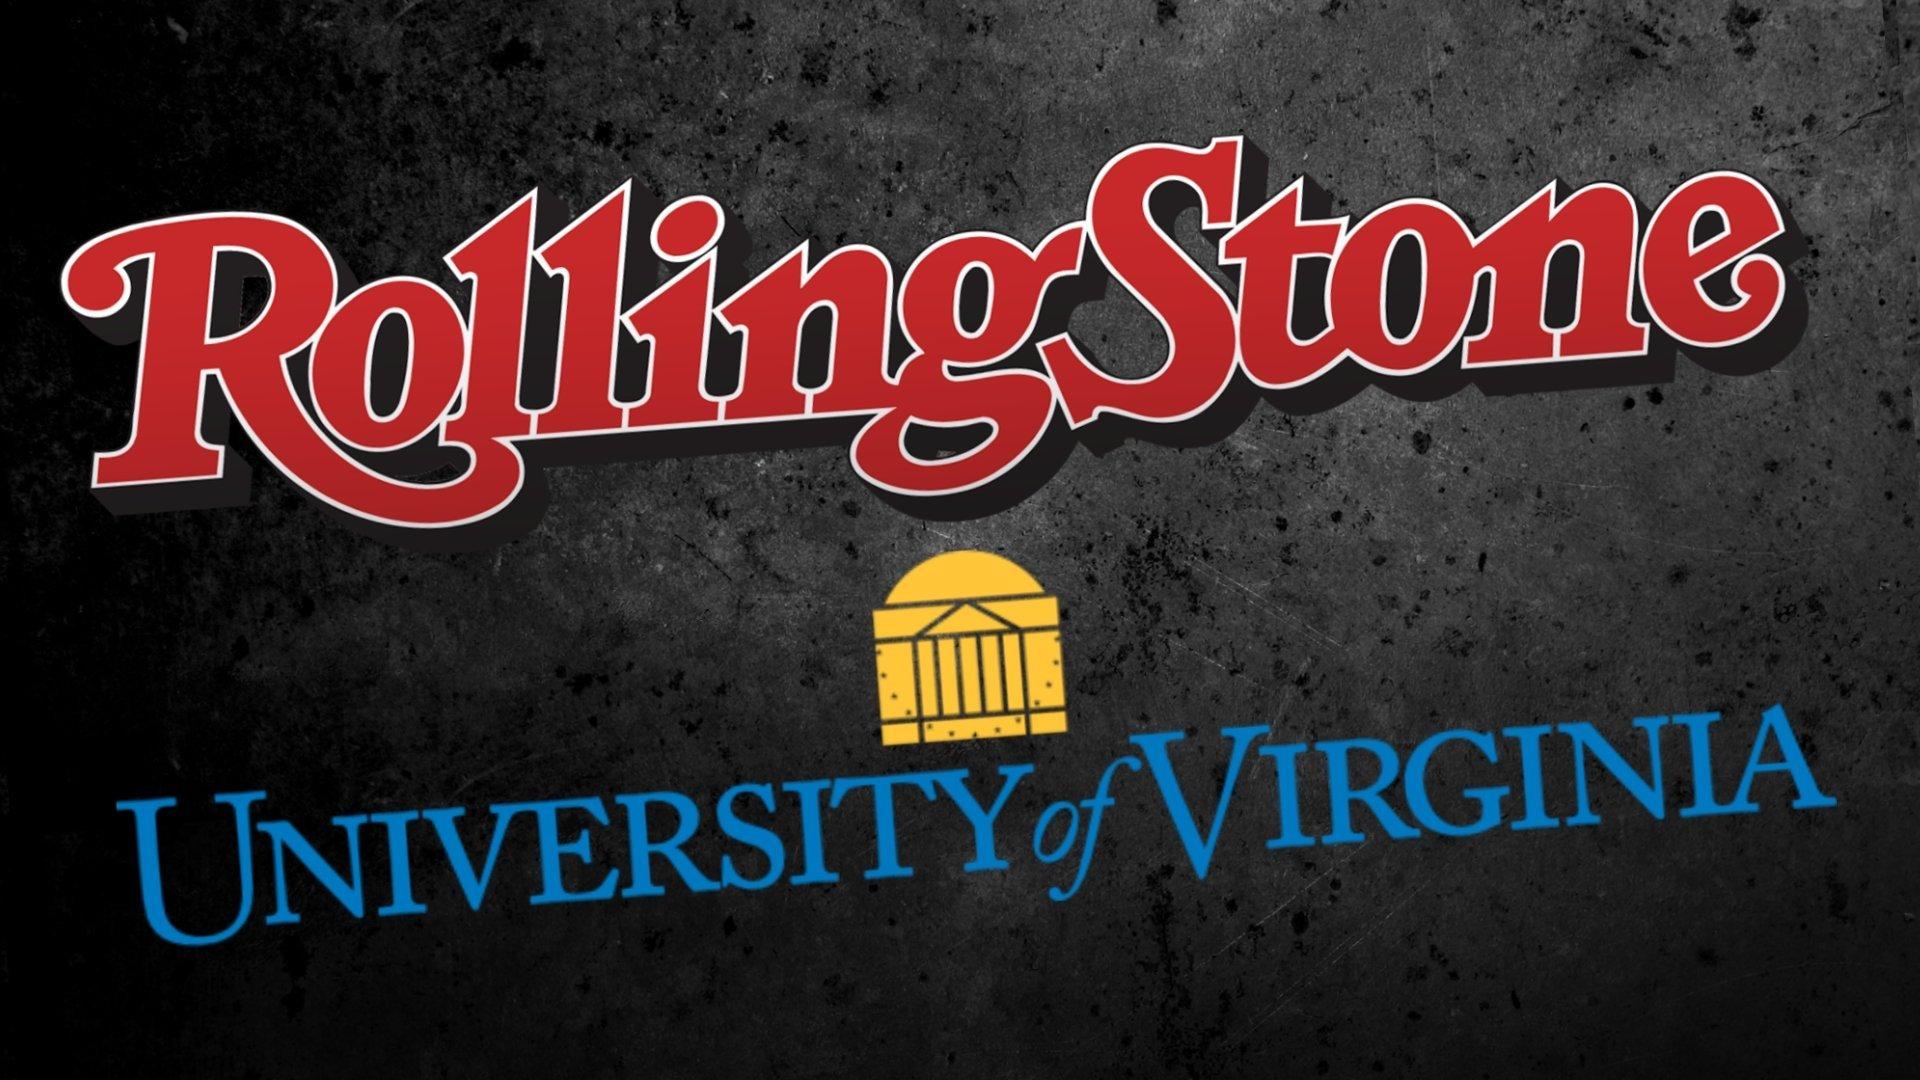 UVA Rolling Stone Defamation Trial